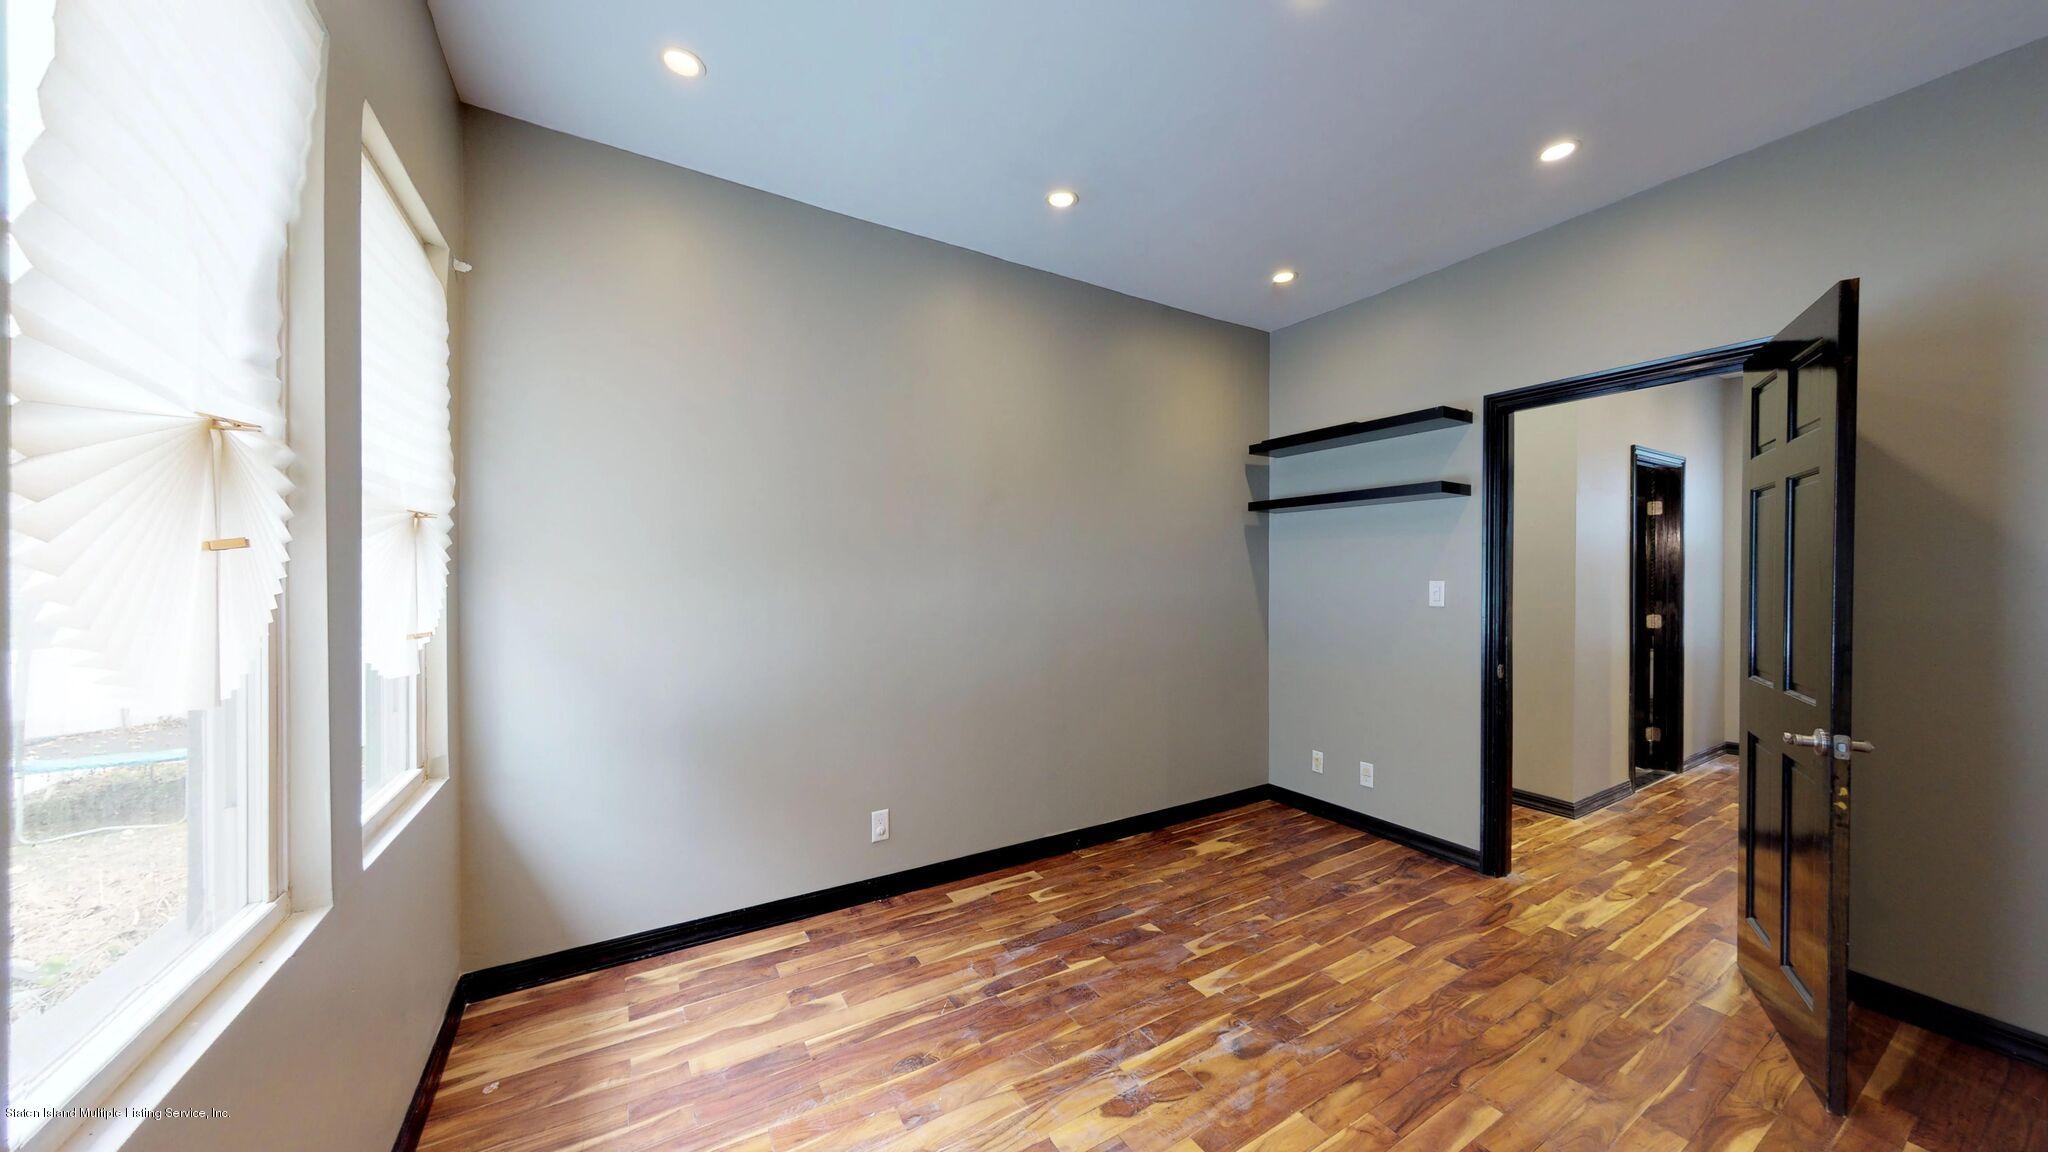 Single Family - Detached 128 Pelton Avenue  Staten Island, NY 10310, MLS-1124023-19